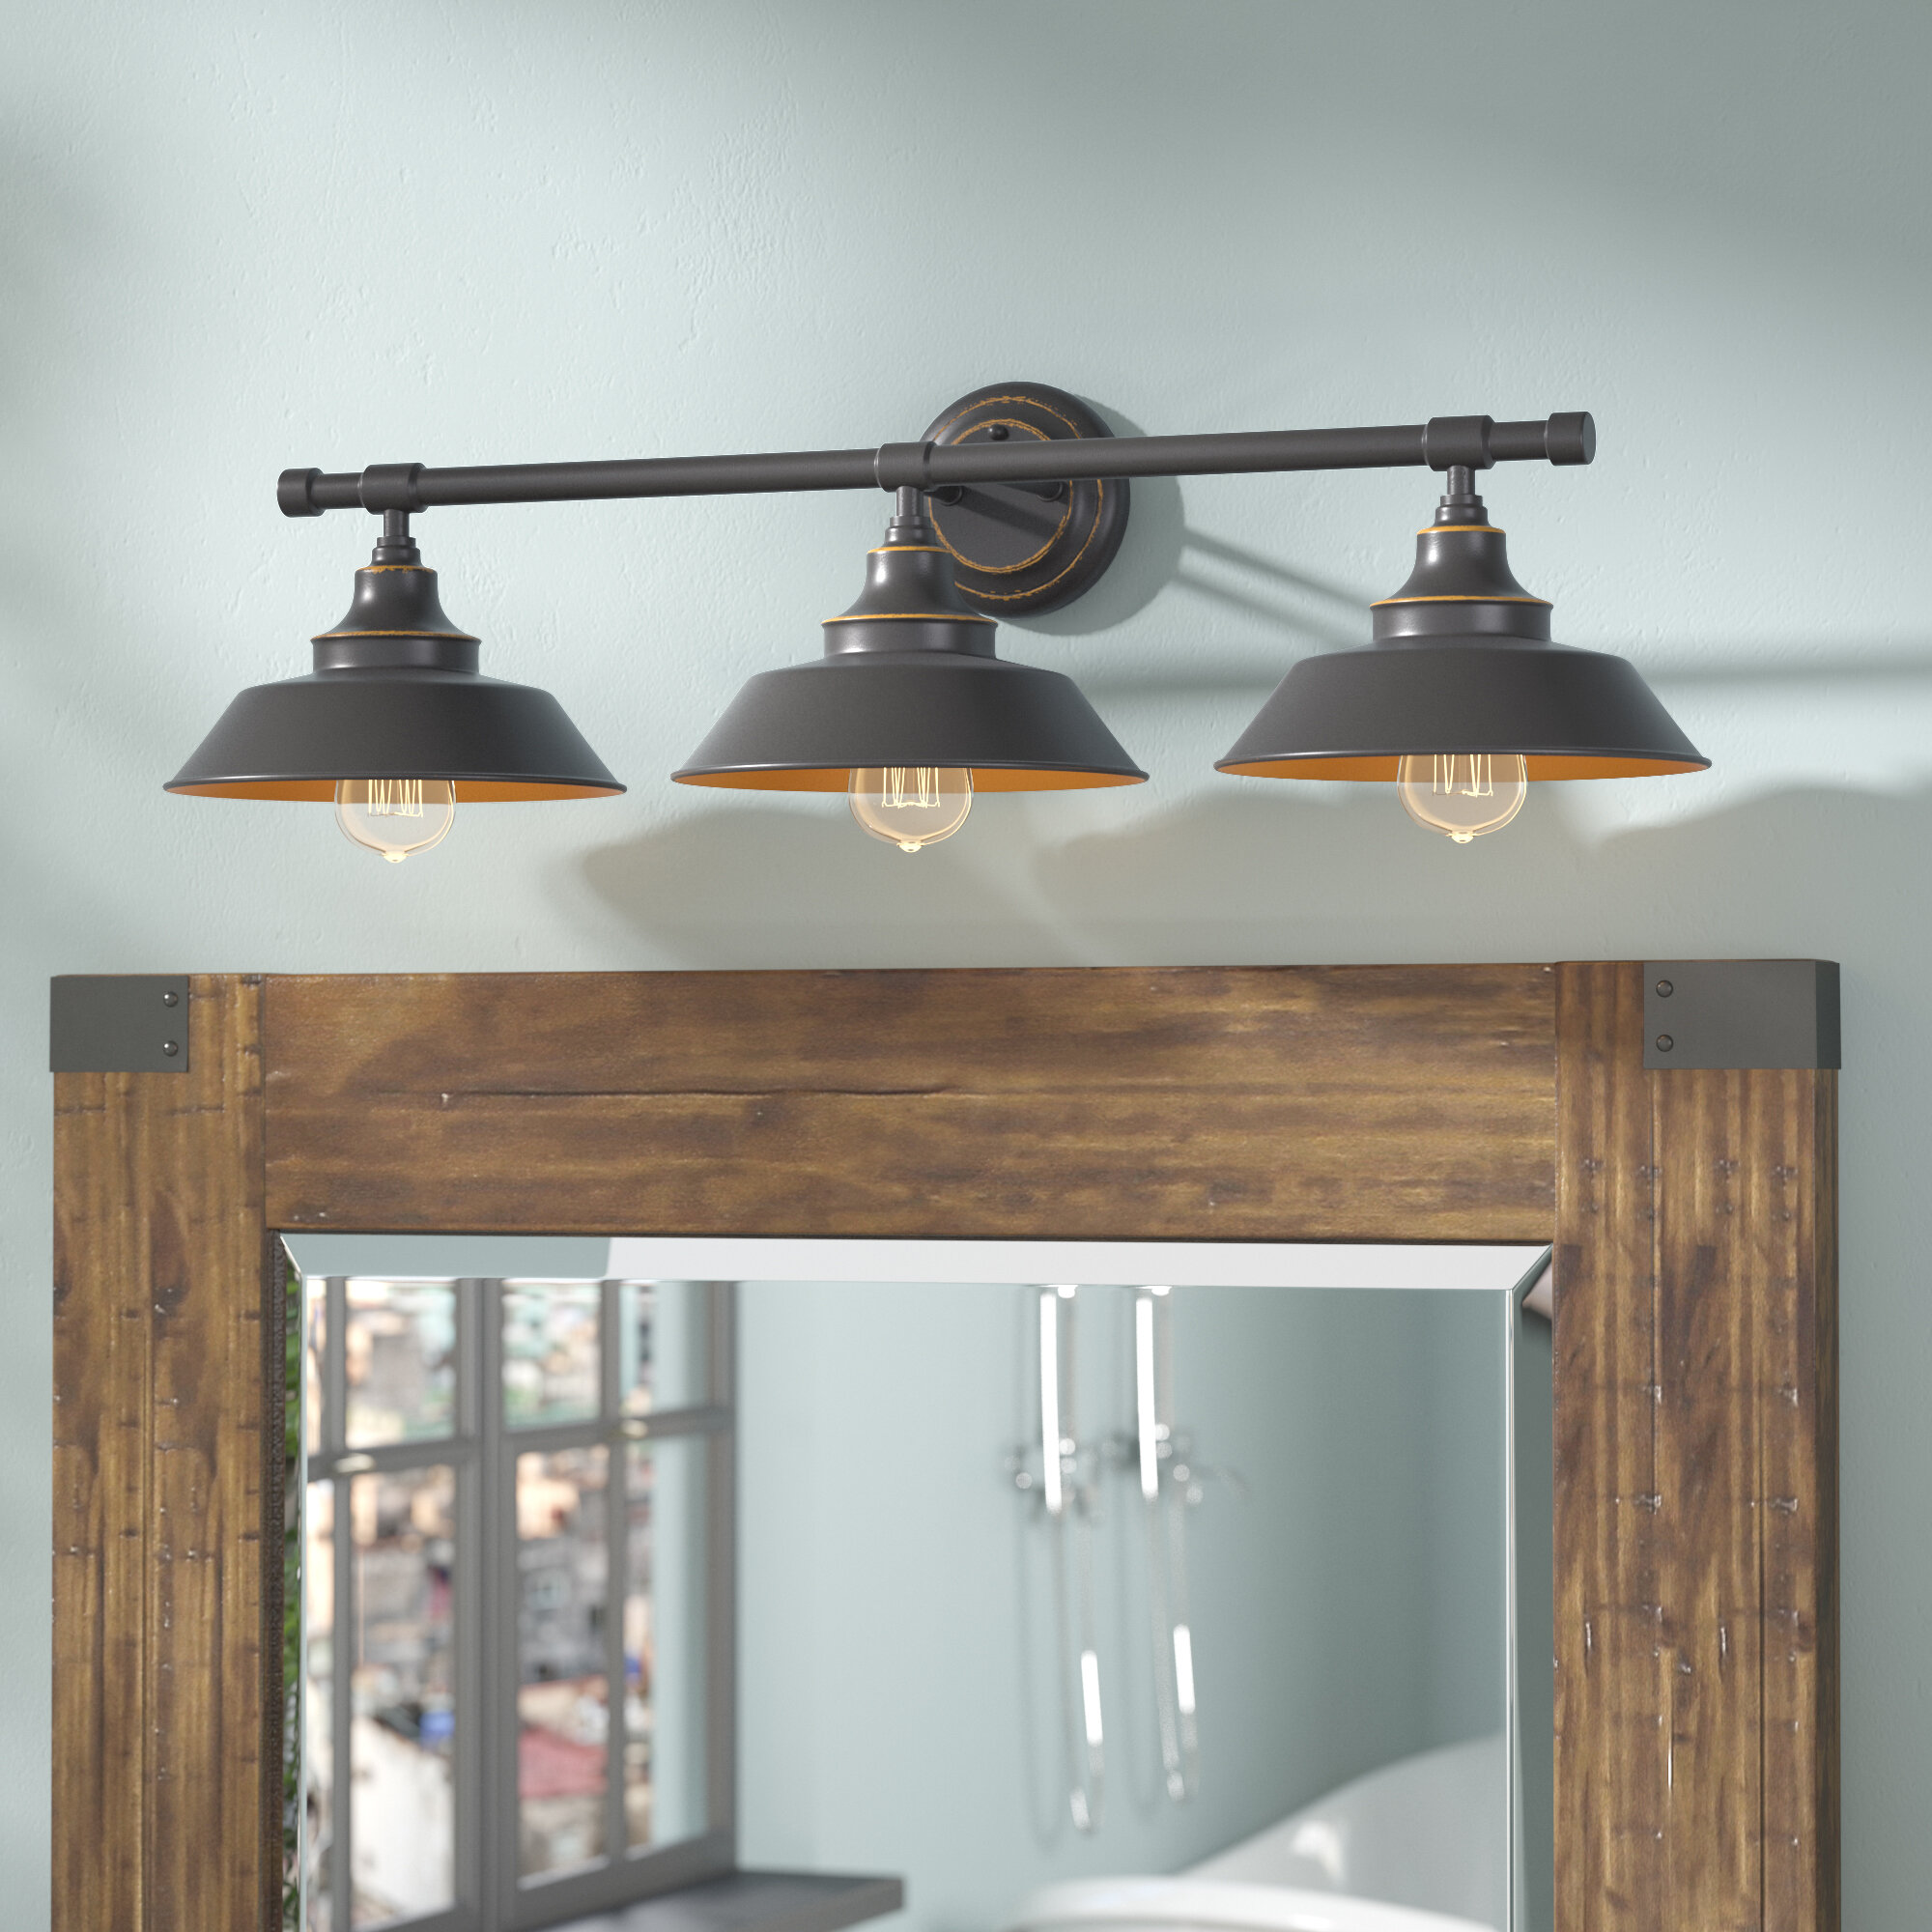 Williston Forge Myndi 3 Light Dimmable Oil Rubbed Bronze Vanity Light Reviews Wayfair